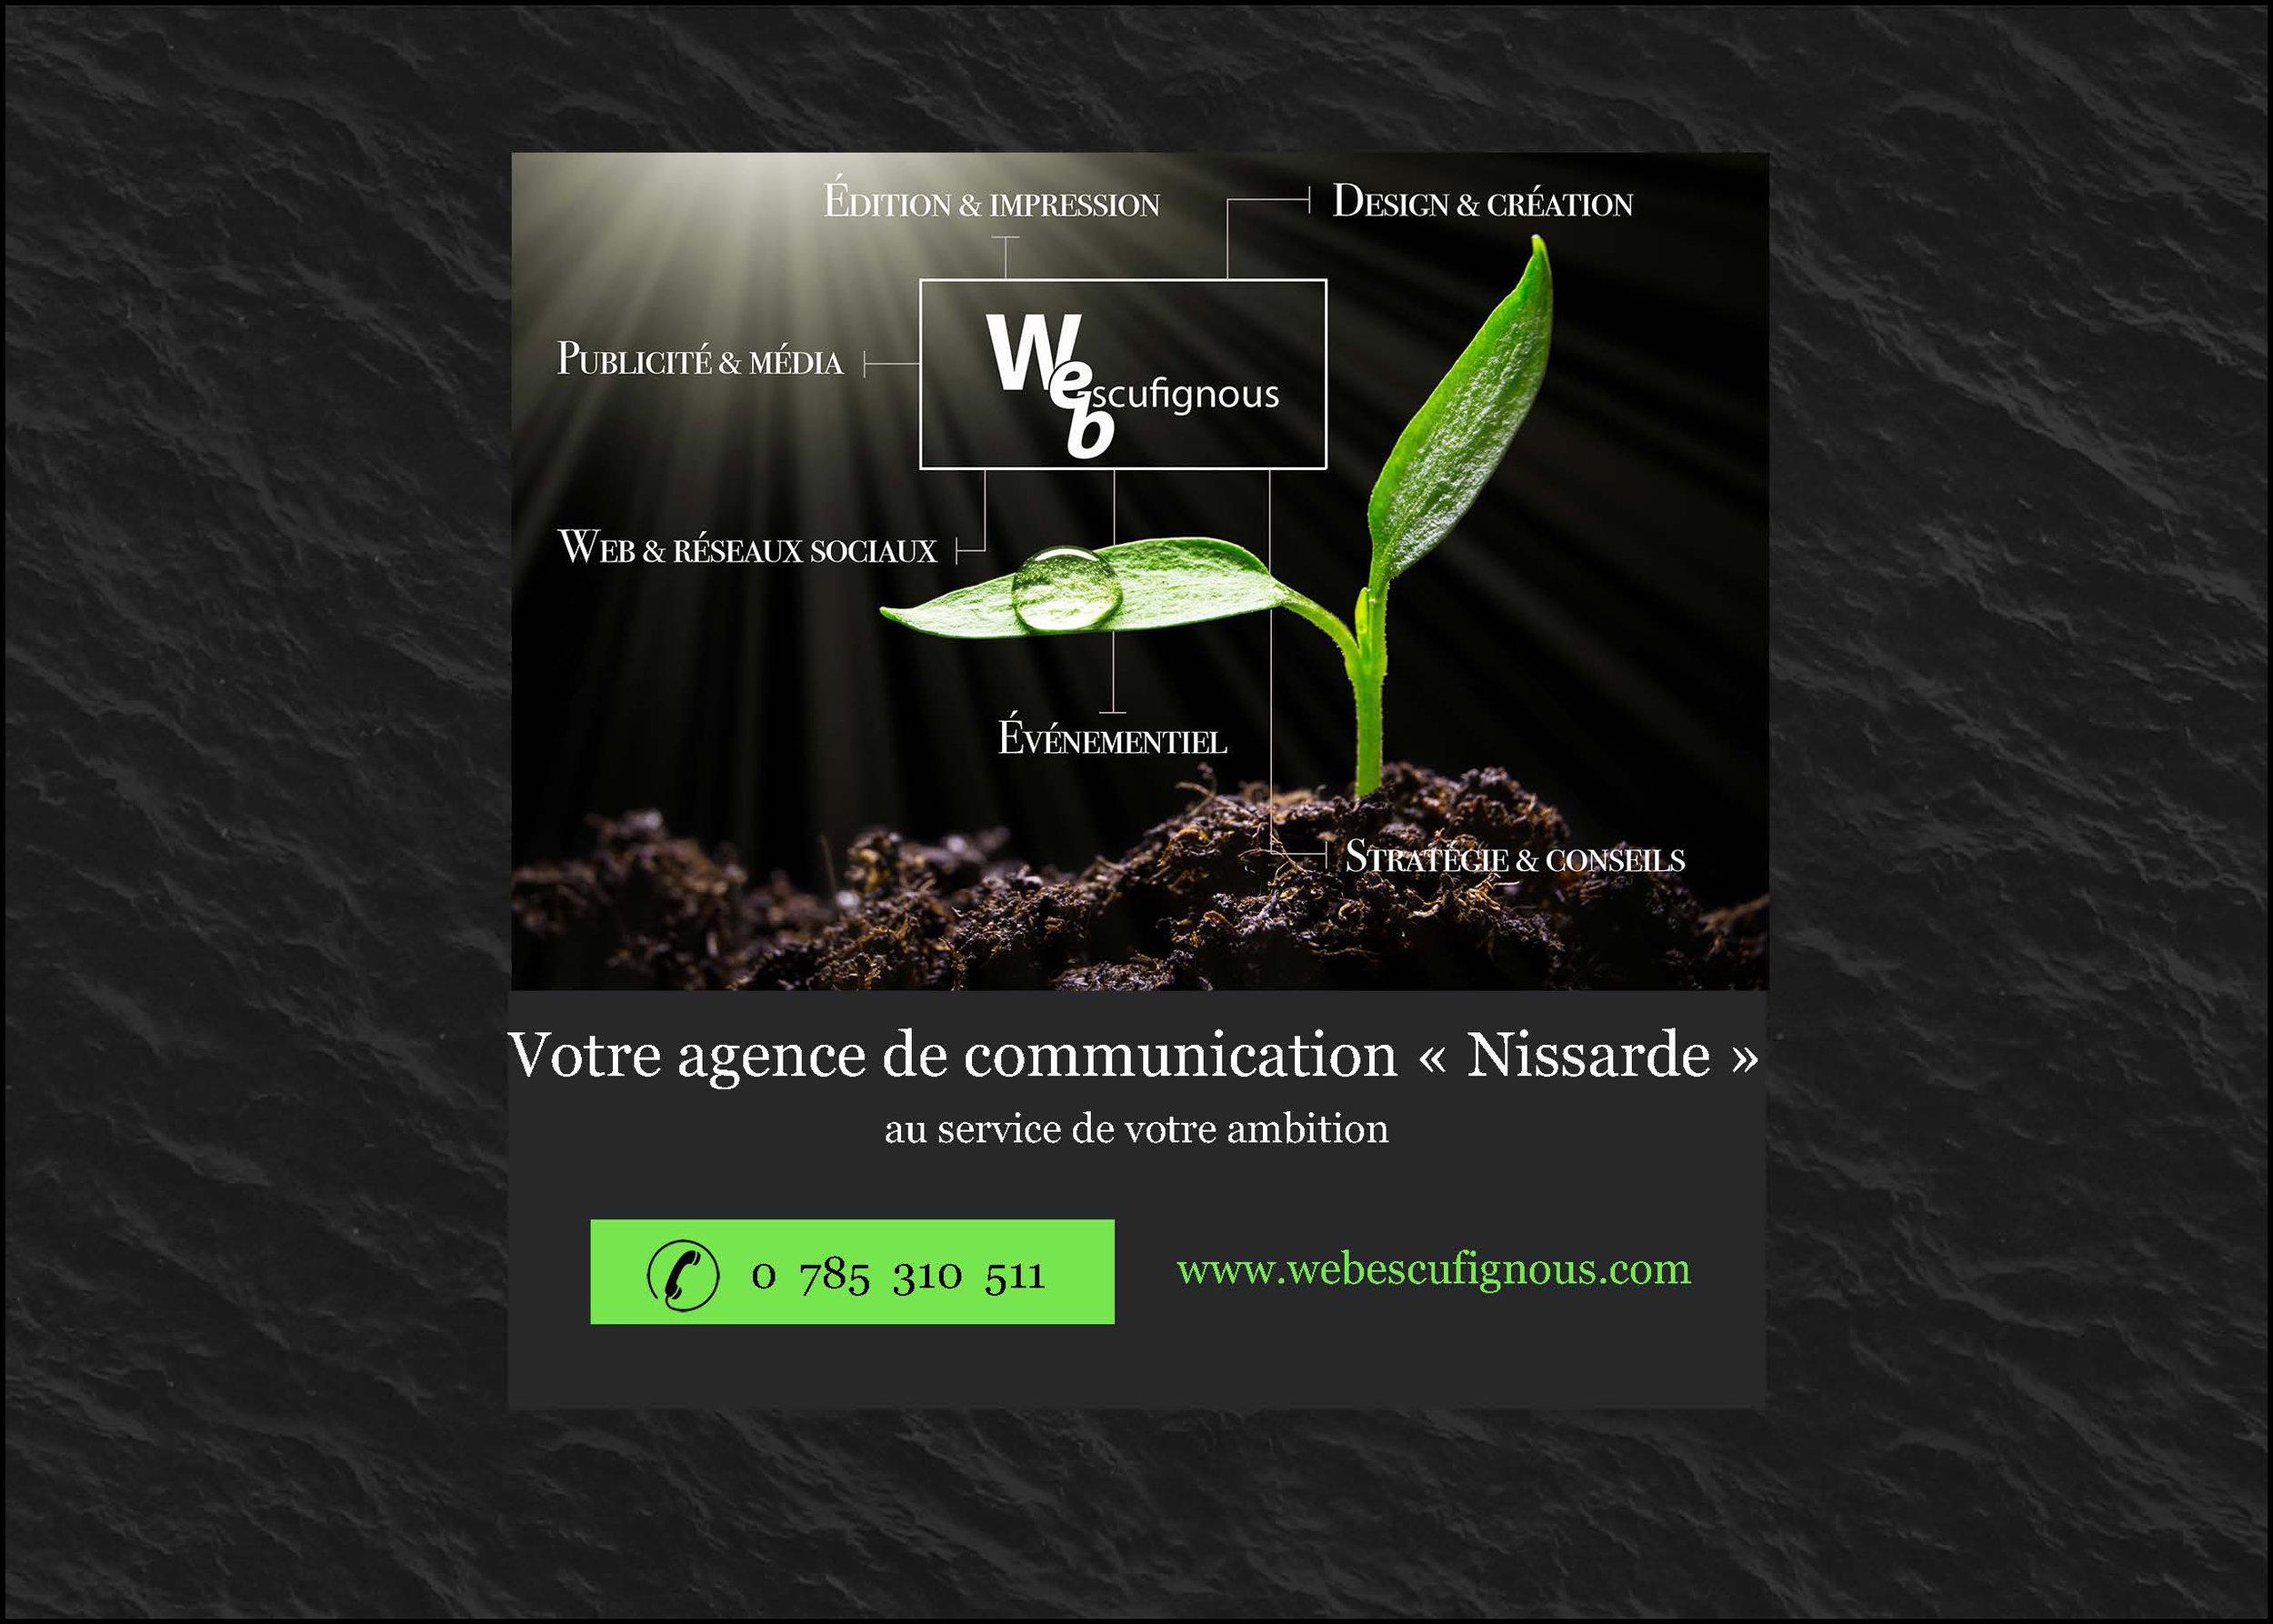 Webescufignous N.jpg